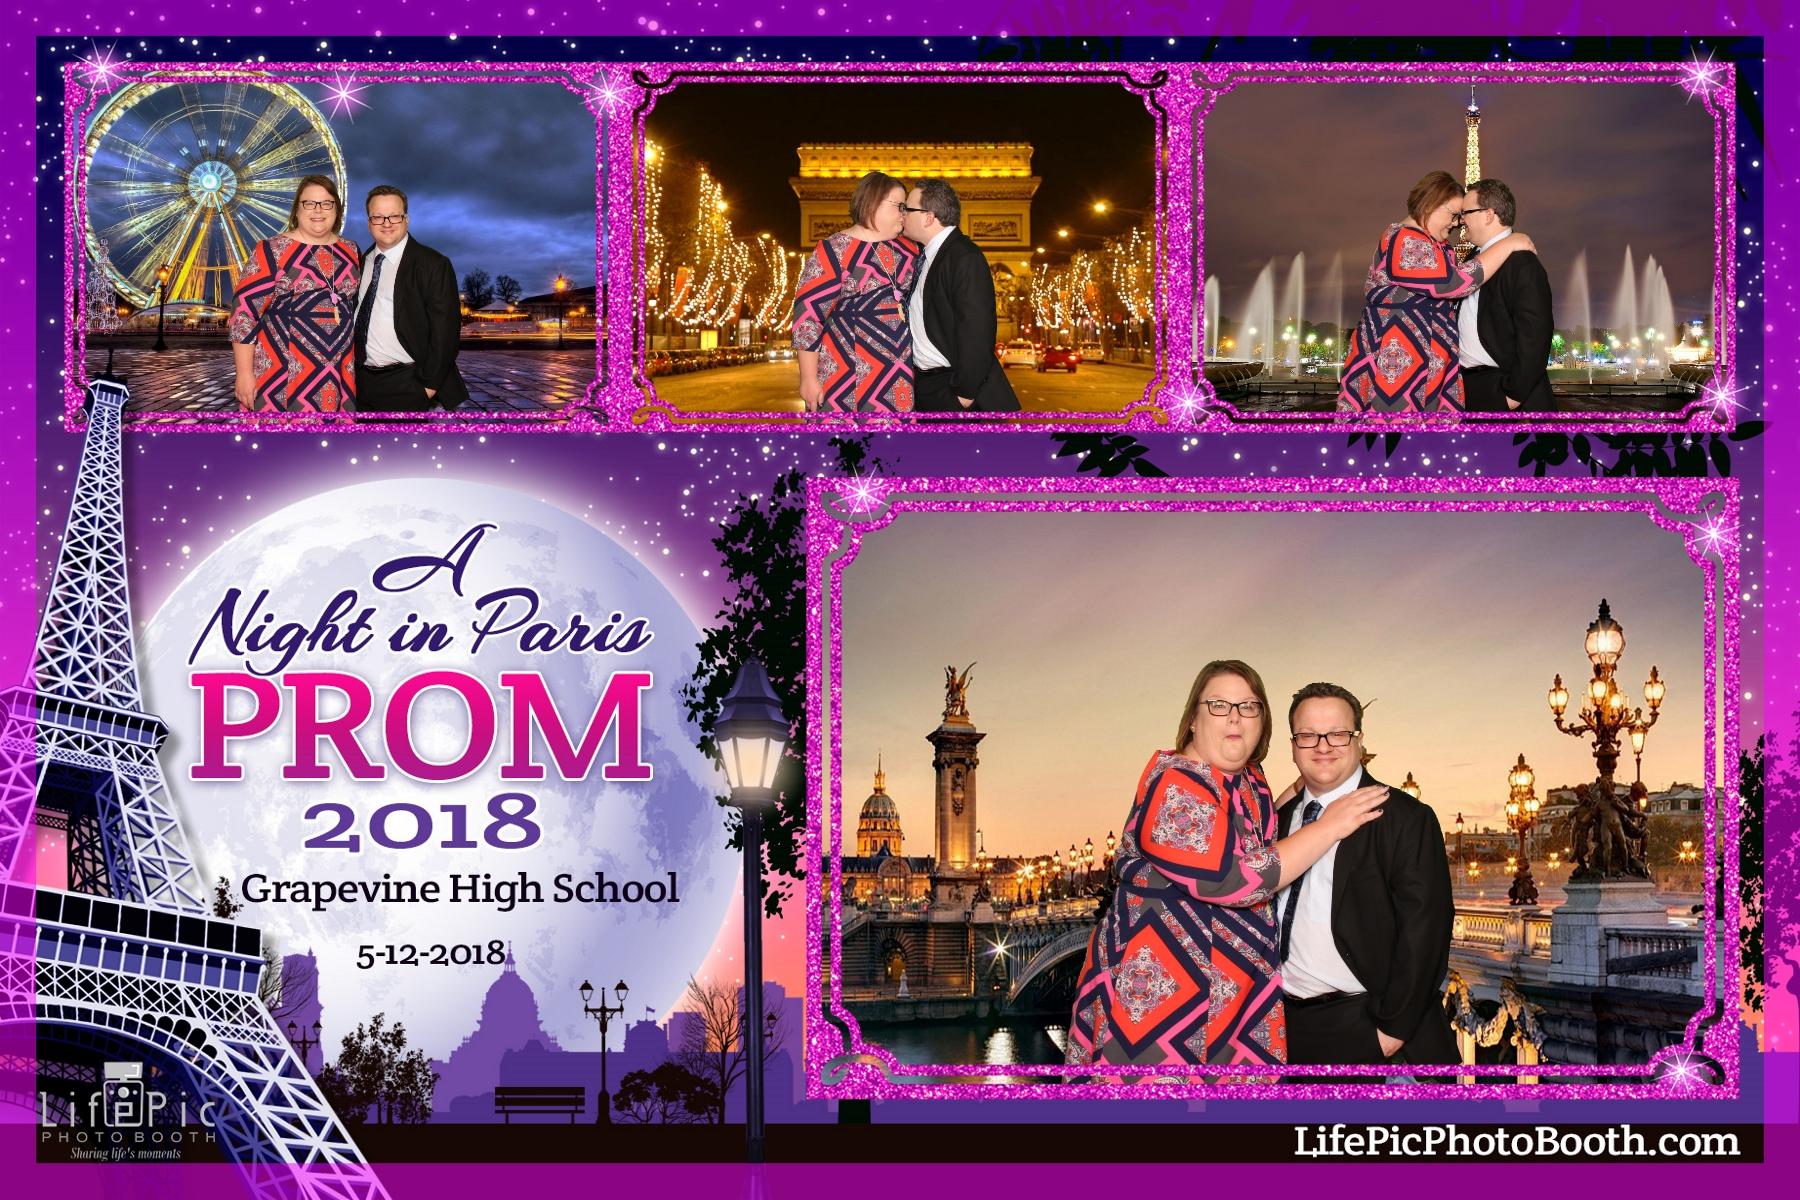 Grapevine High School Prom_2018-05-12_23